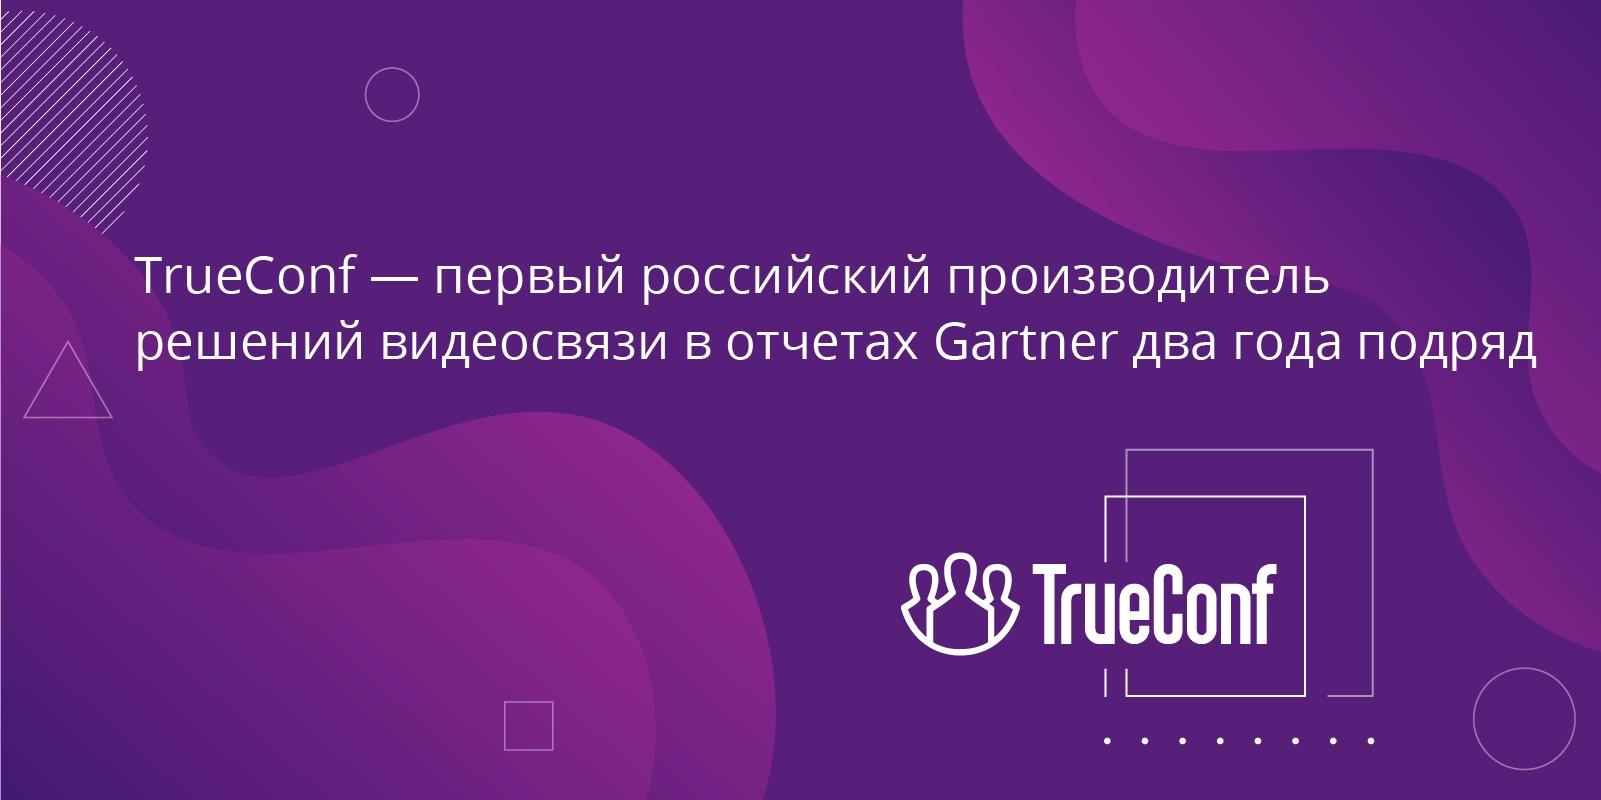 TrueConf дважды в отчетах Gartner 2019-2020